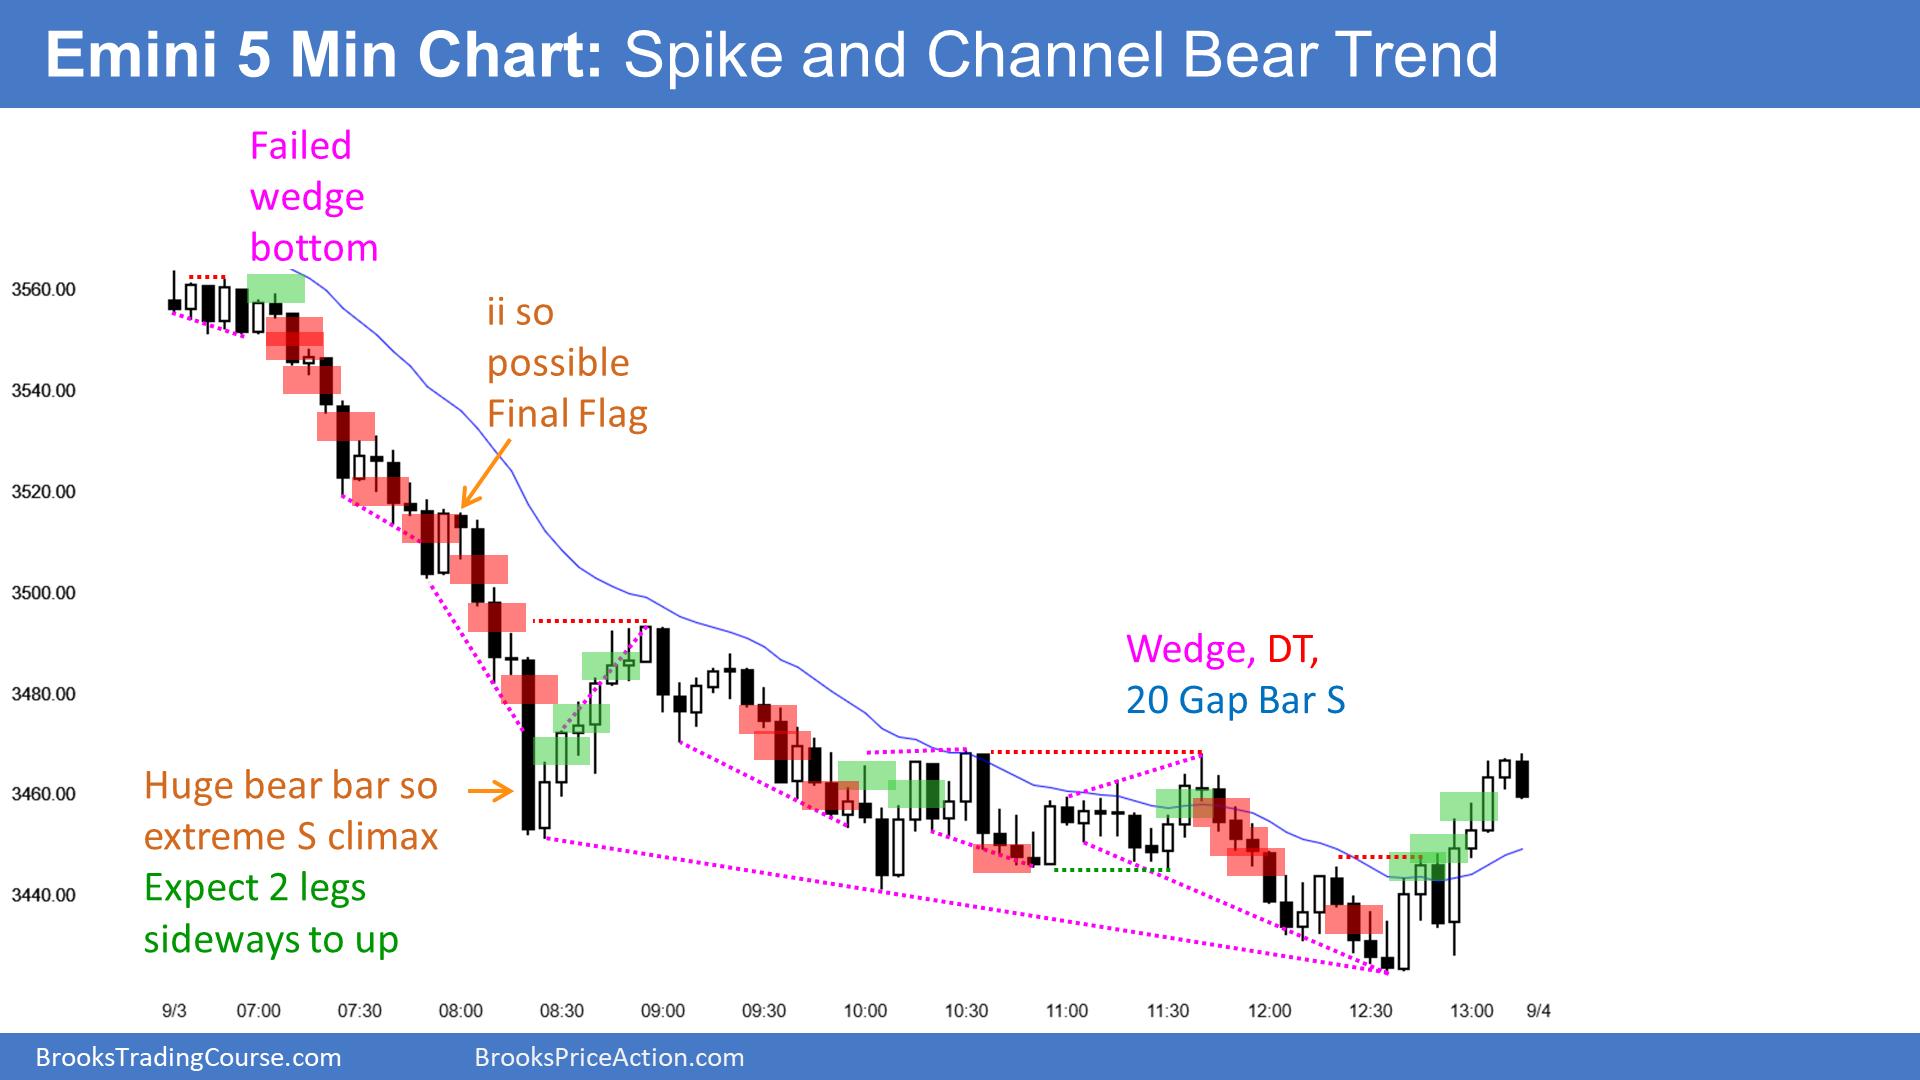 E-mini 5 min chart